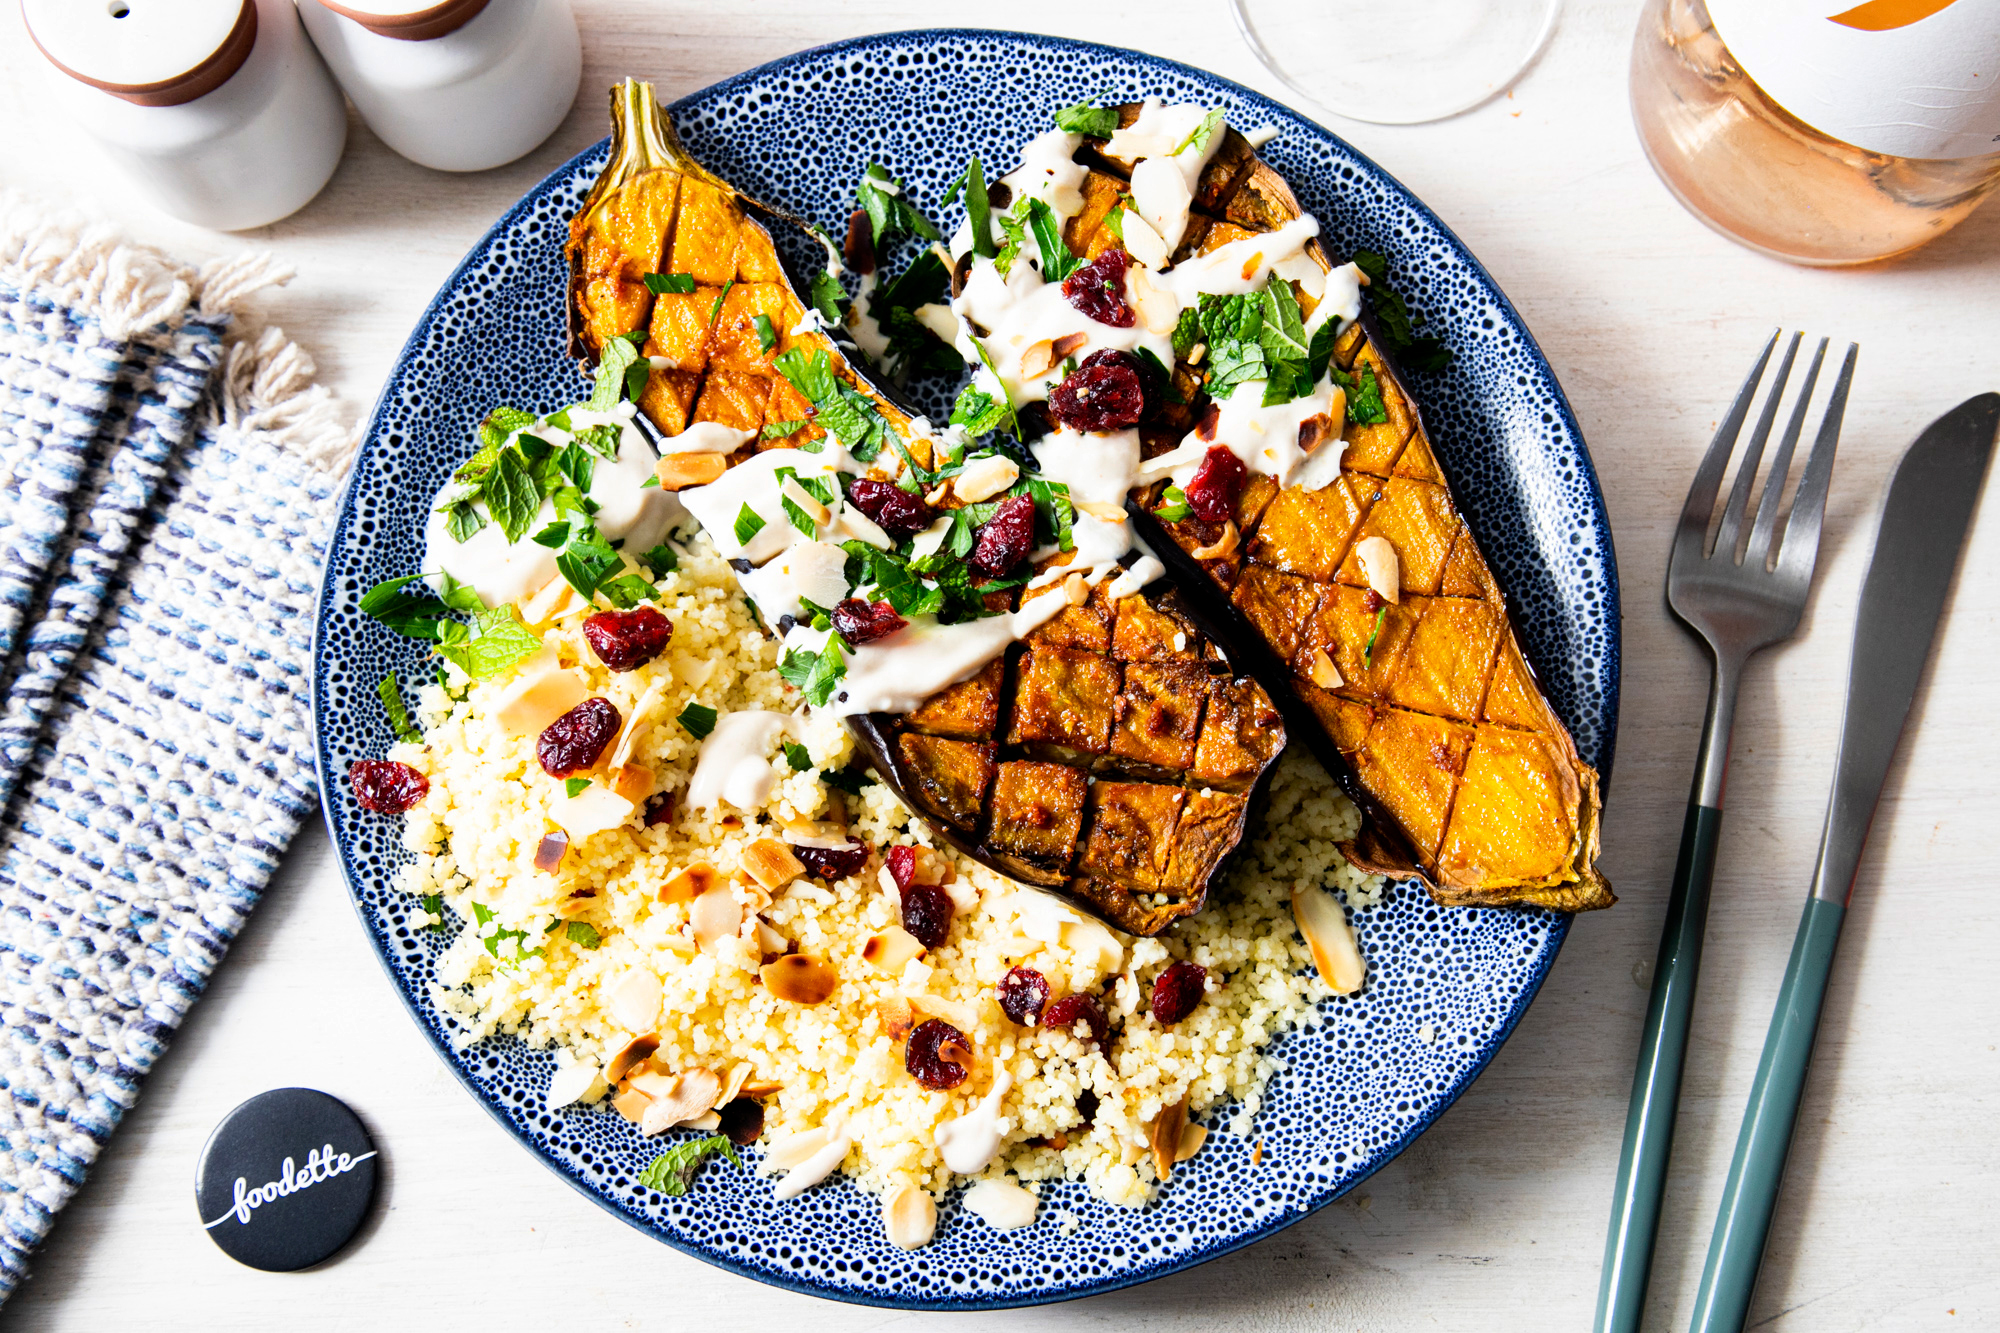 Aubergines rôties, sauce tahini et semoule aux amandes